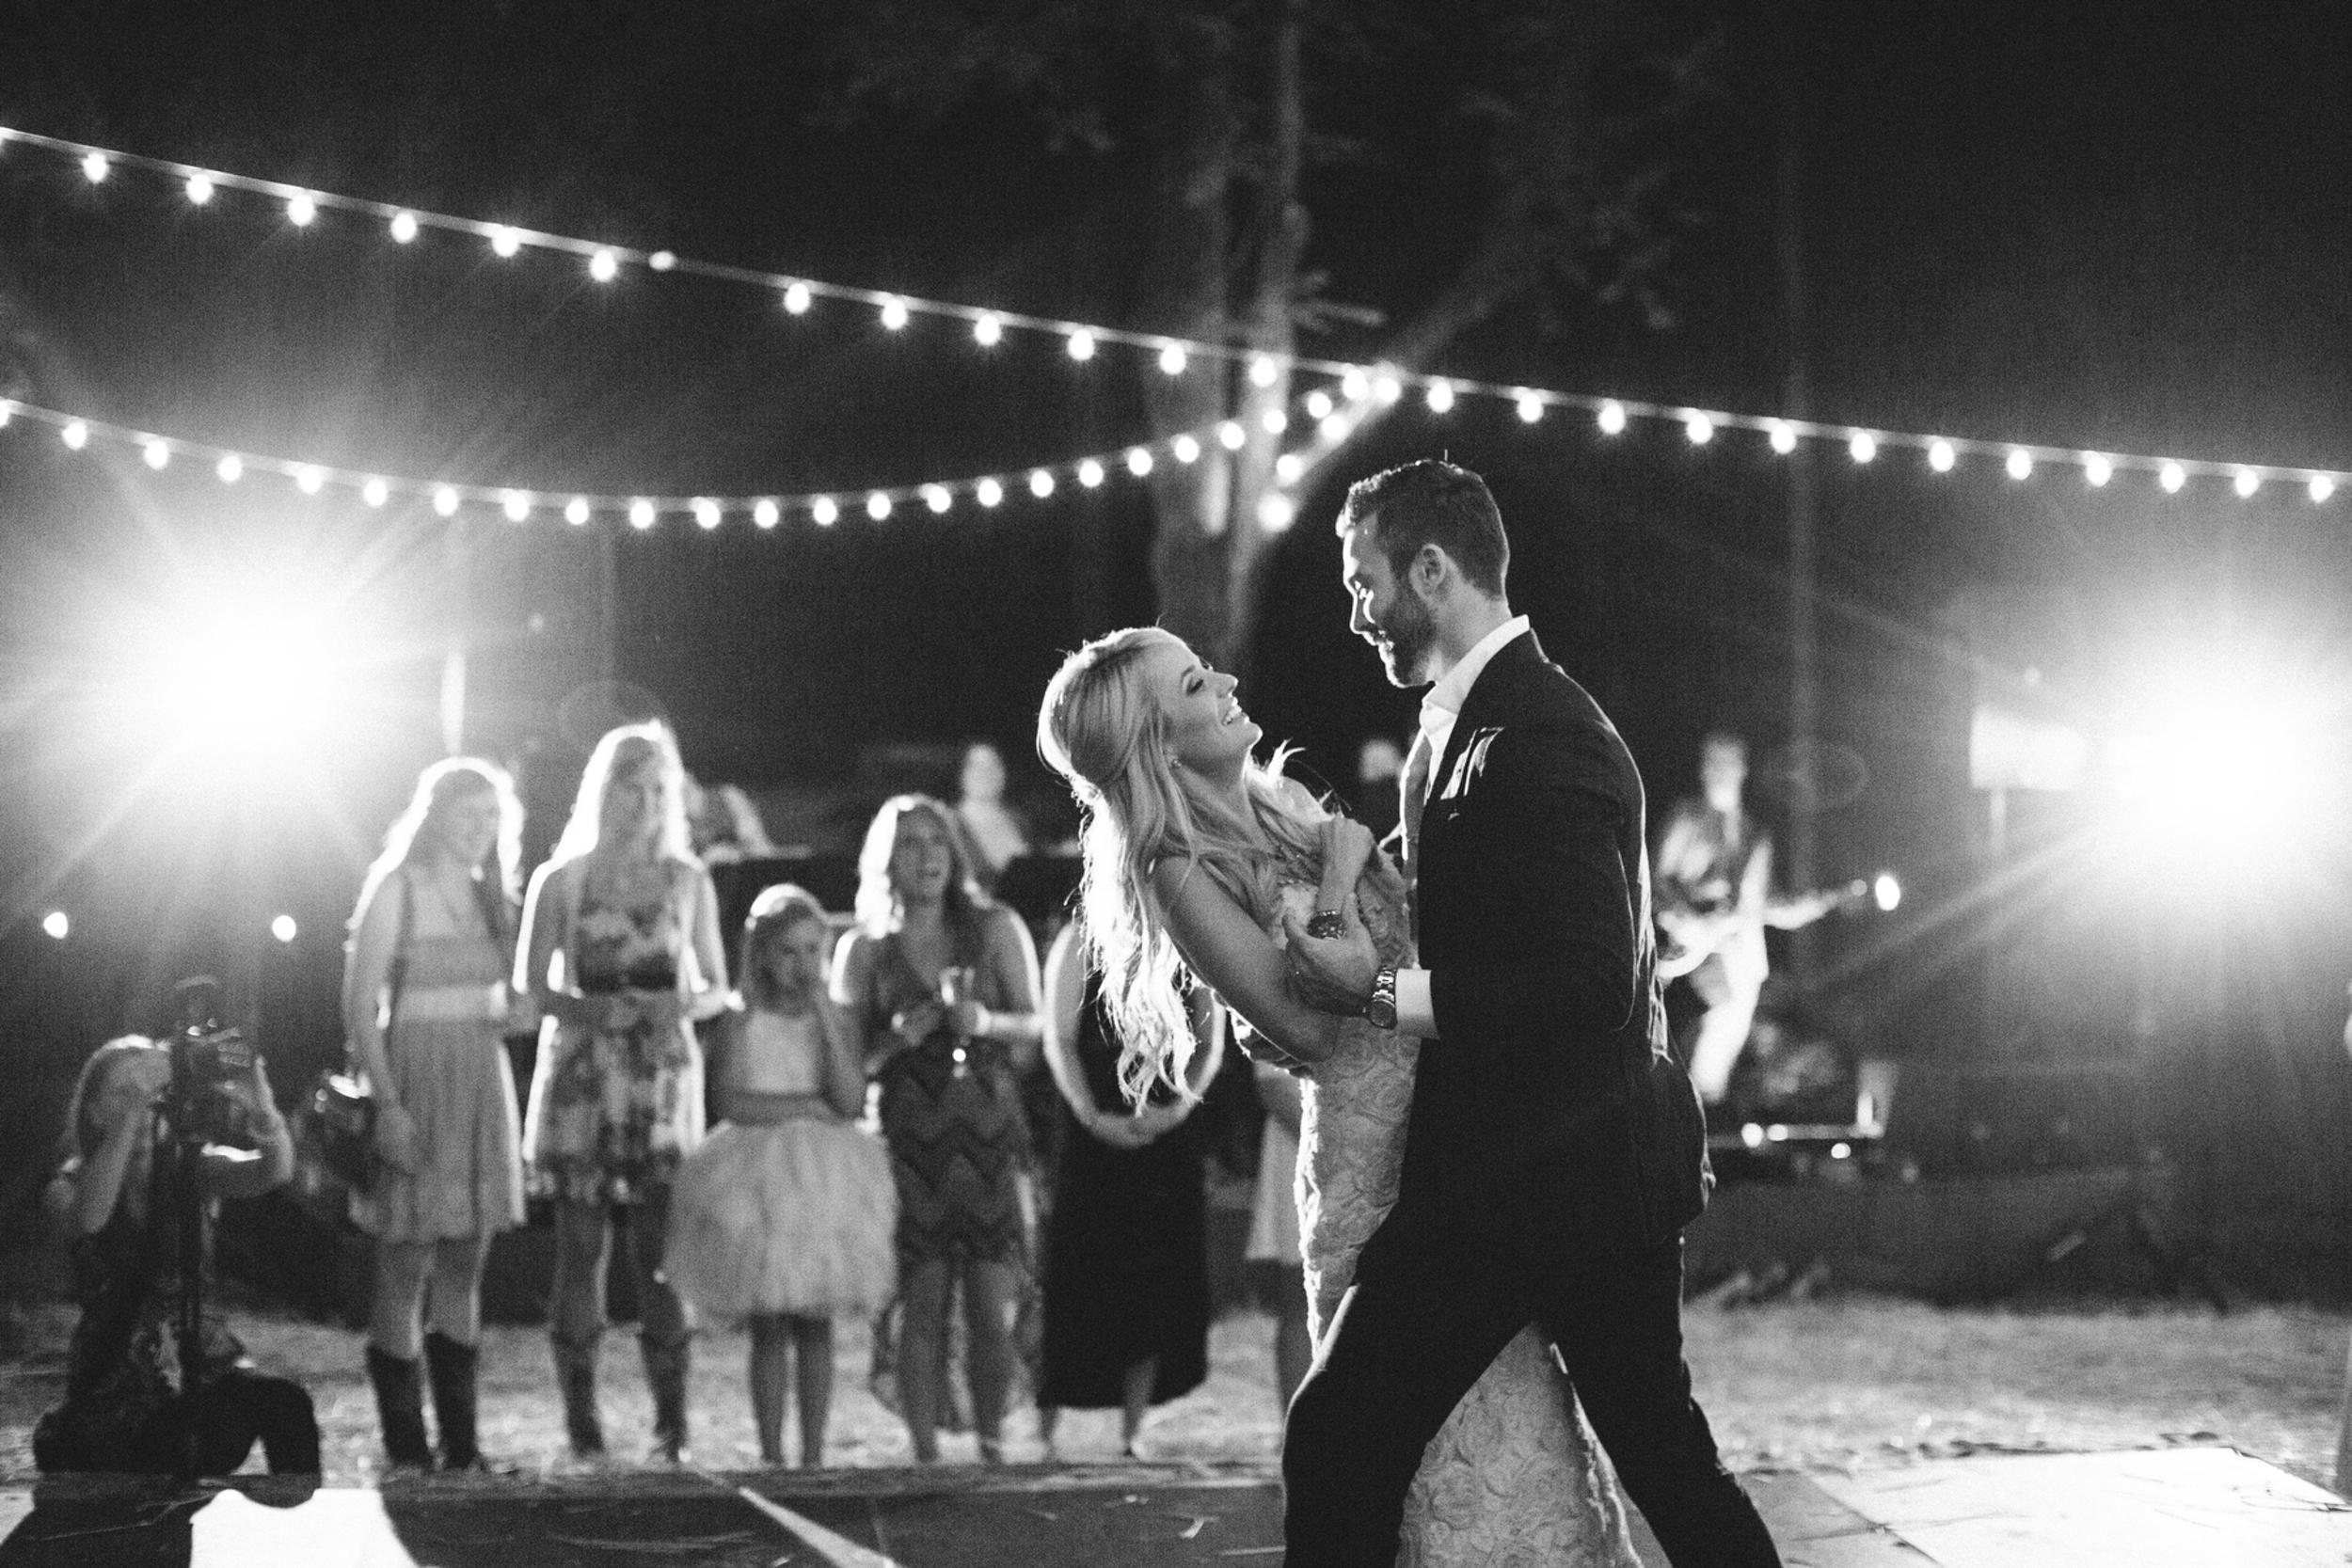 south_carolina_farm_wedding_rustic_chic_surprise_secret_luxe_wedding_bachelorette_emily_maynard_real_weddings-55.jpg